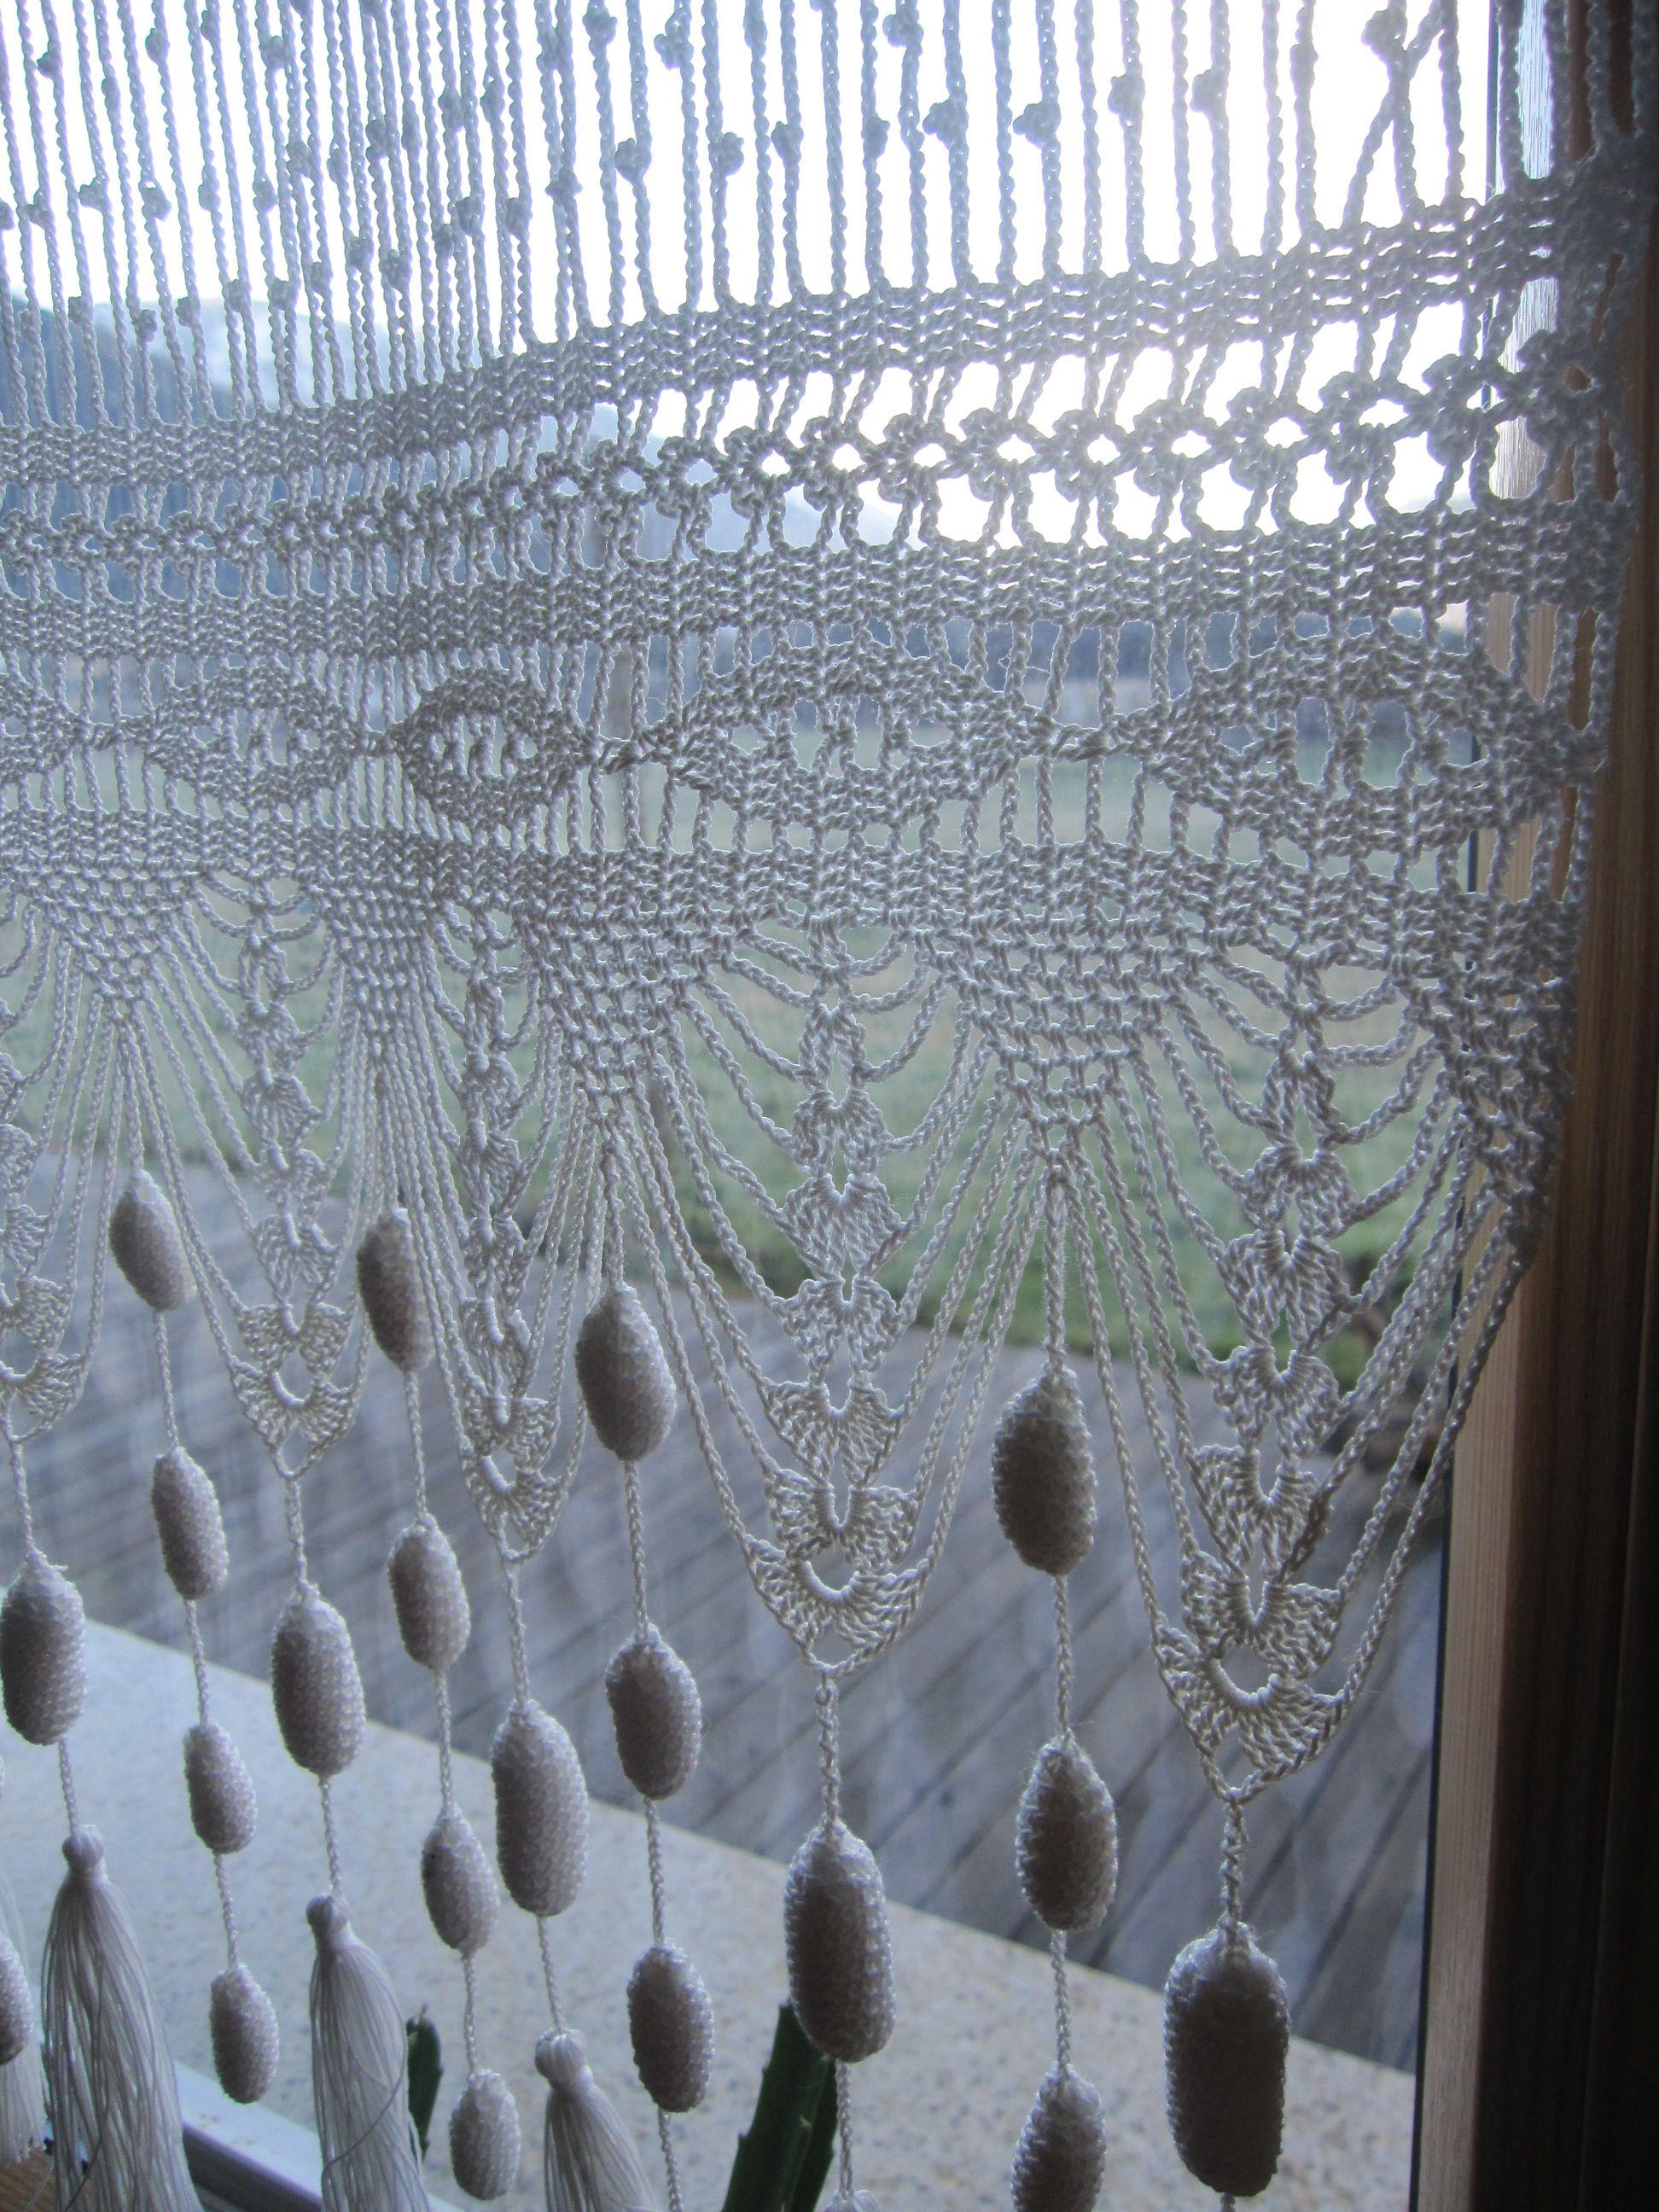 geh kelter vorhang curtain pinterest vorh nge h keln und gardinen. Black Bedroom Furniture Sets. Home Design Ideas